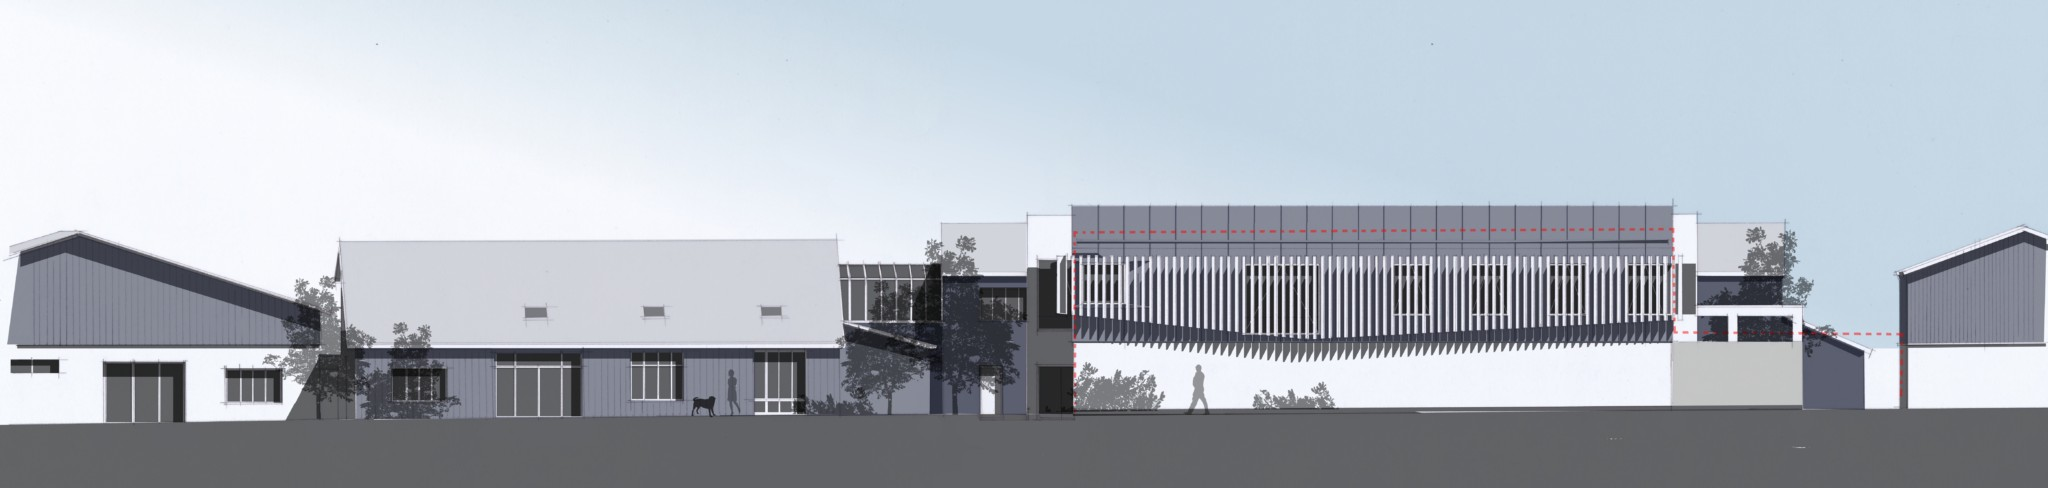 Noel Fitzpatrick Cost >> Fitzpatrick Referrals - New Veterinary Hospital - MVL Architects